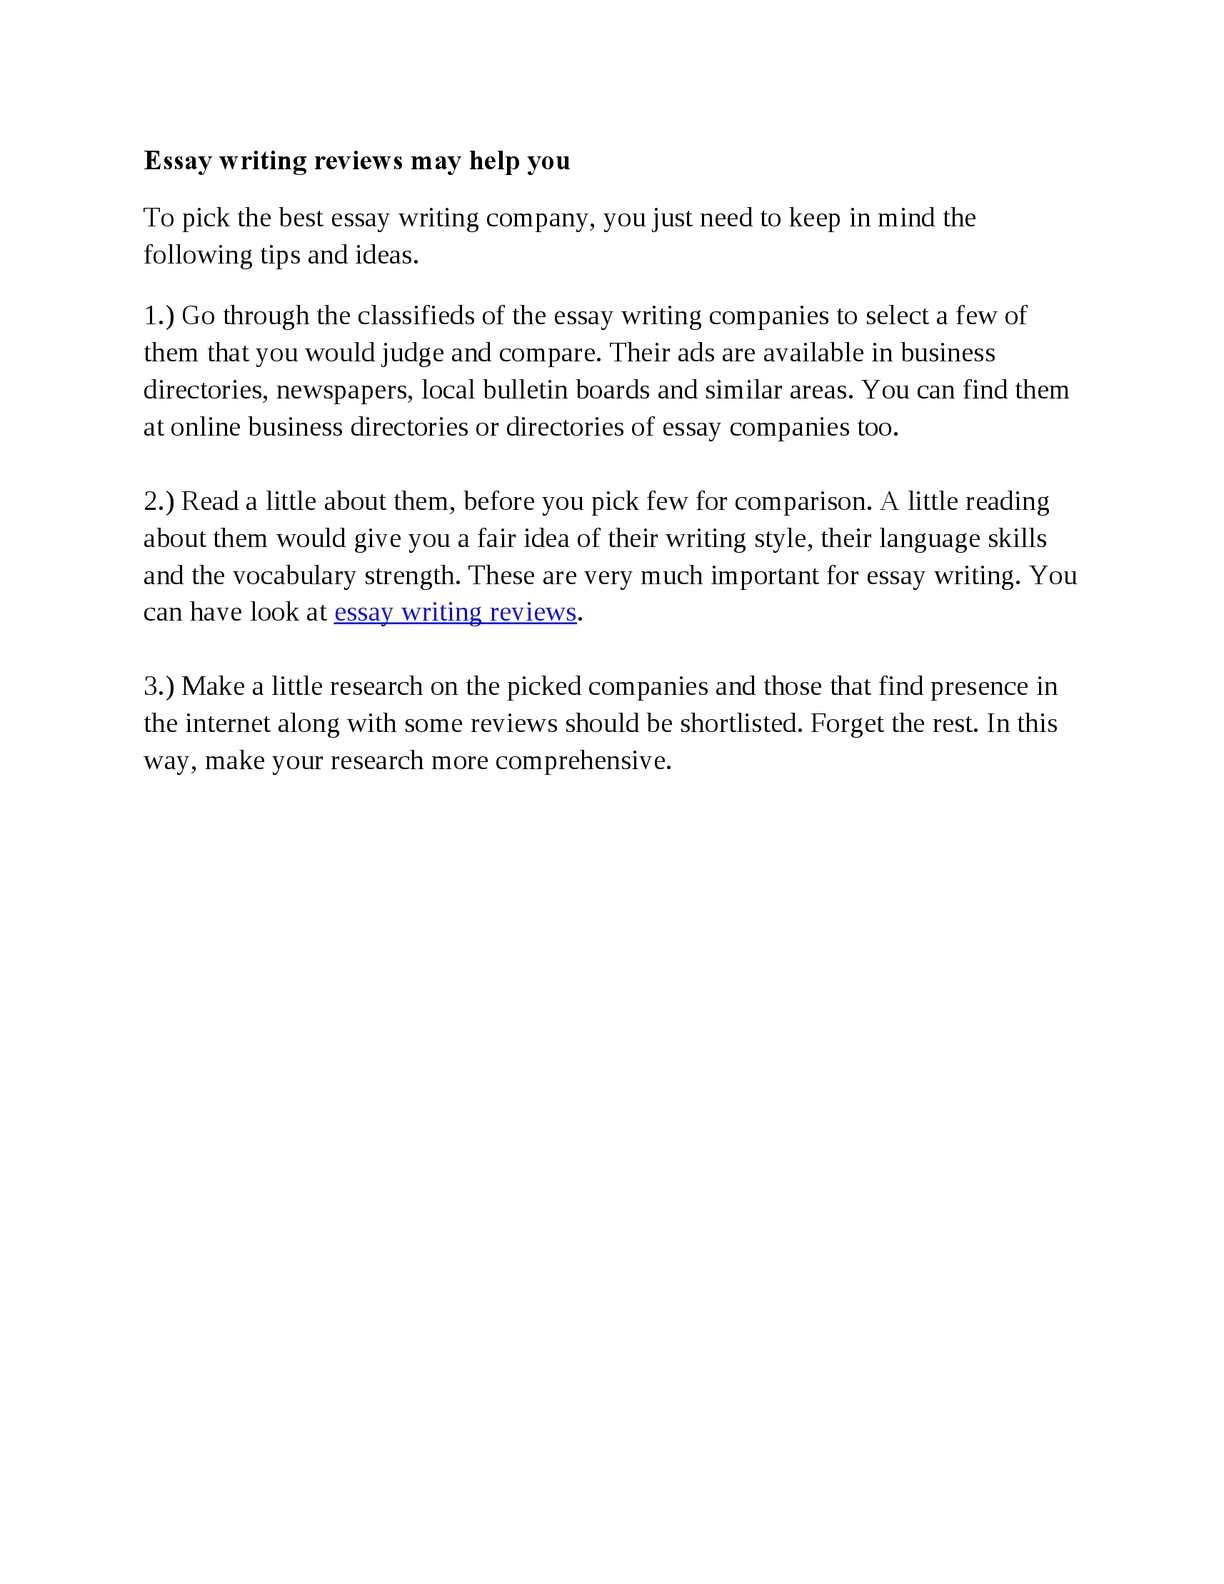 calamo   essay writing reviews may help you